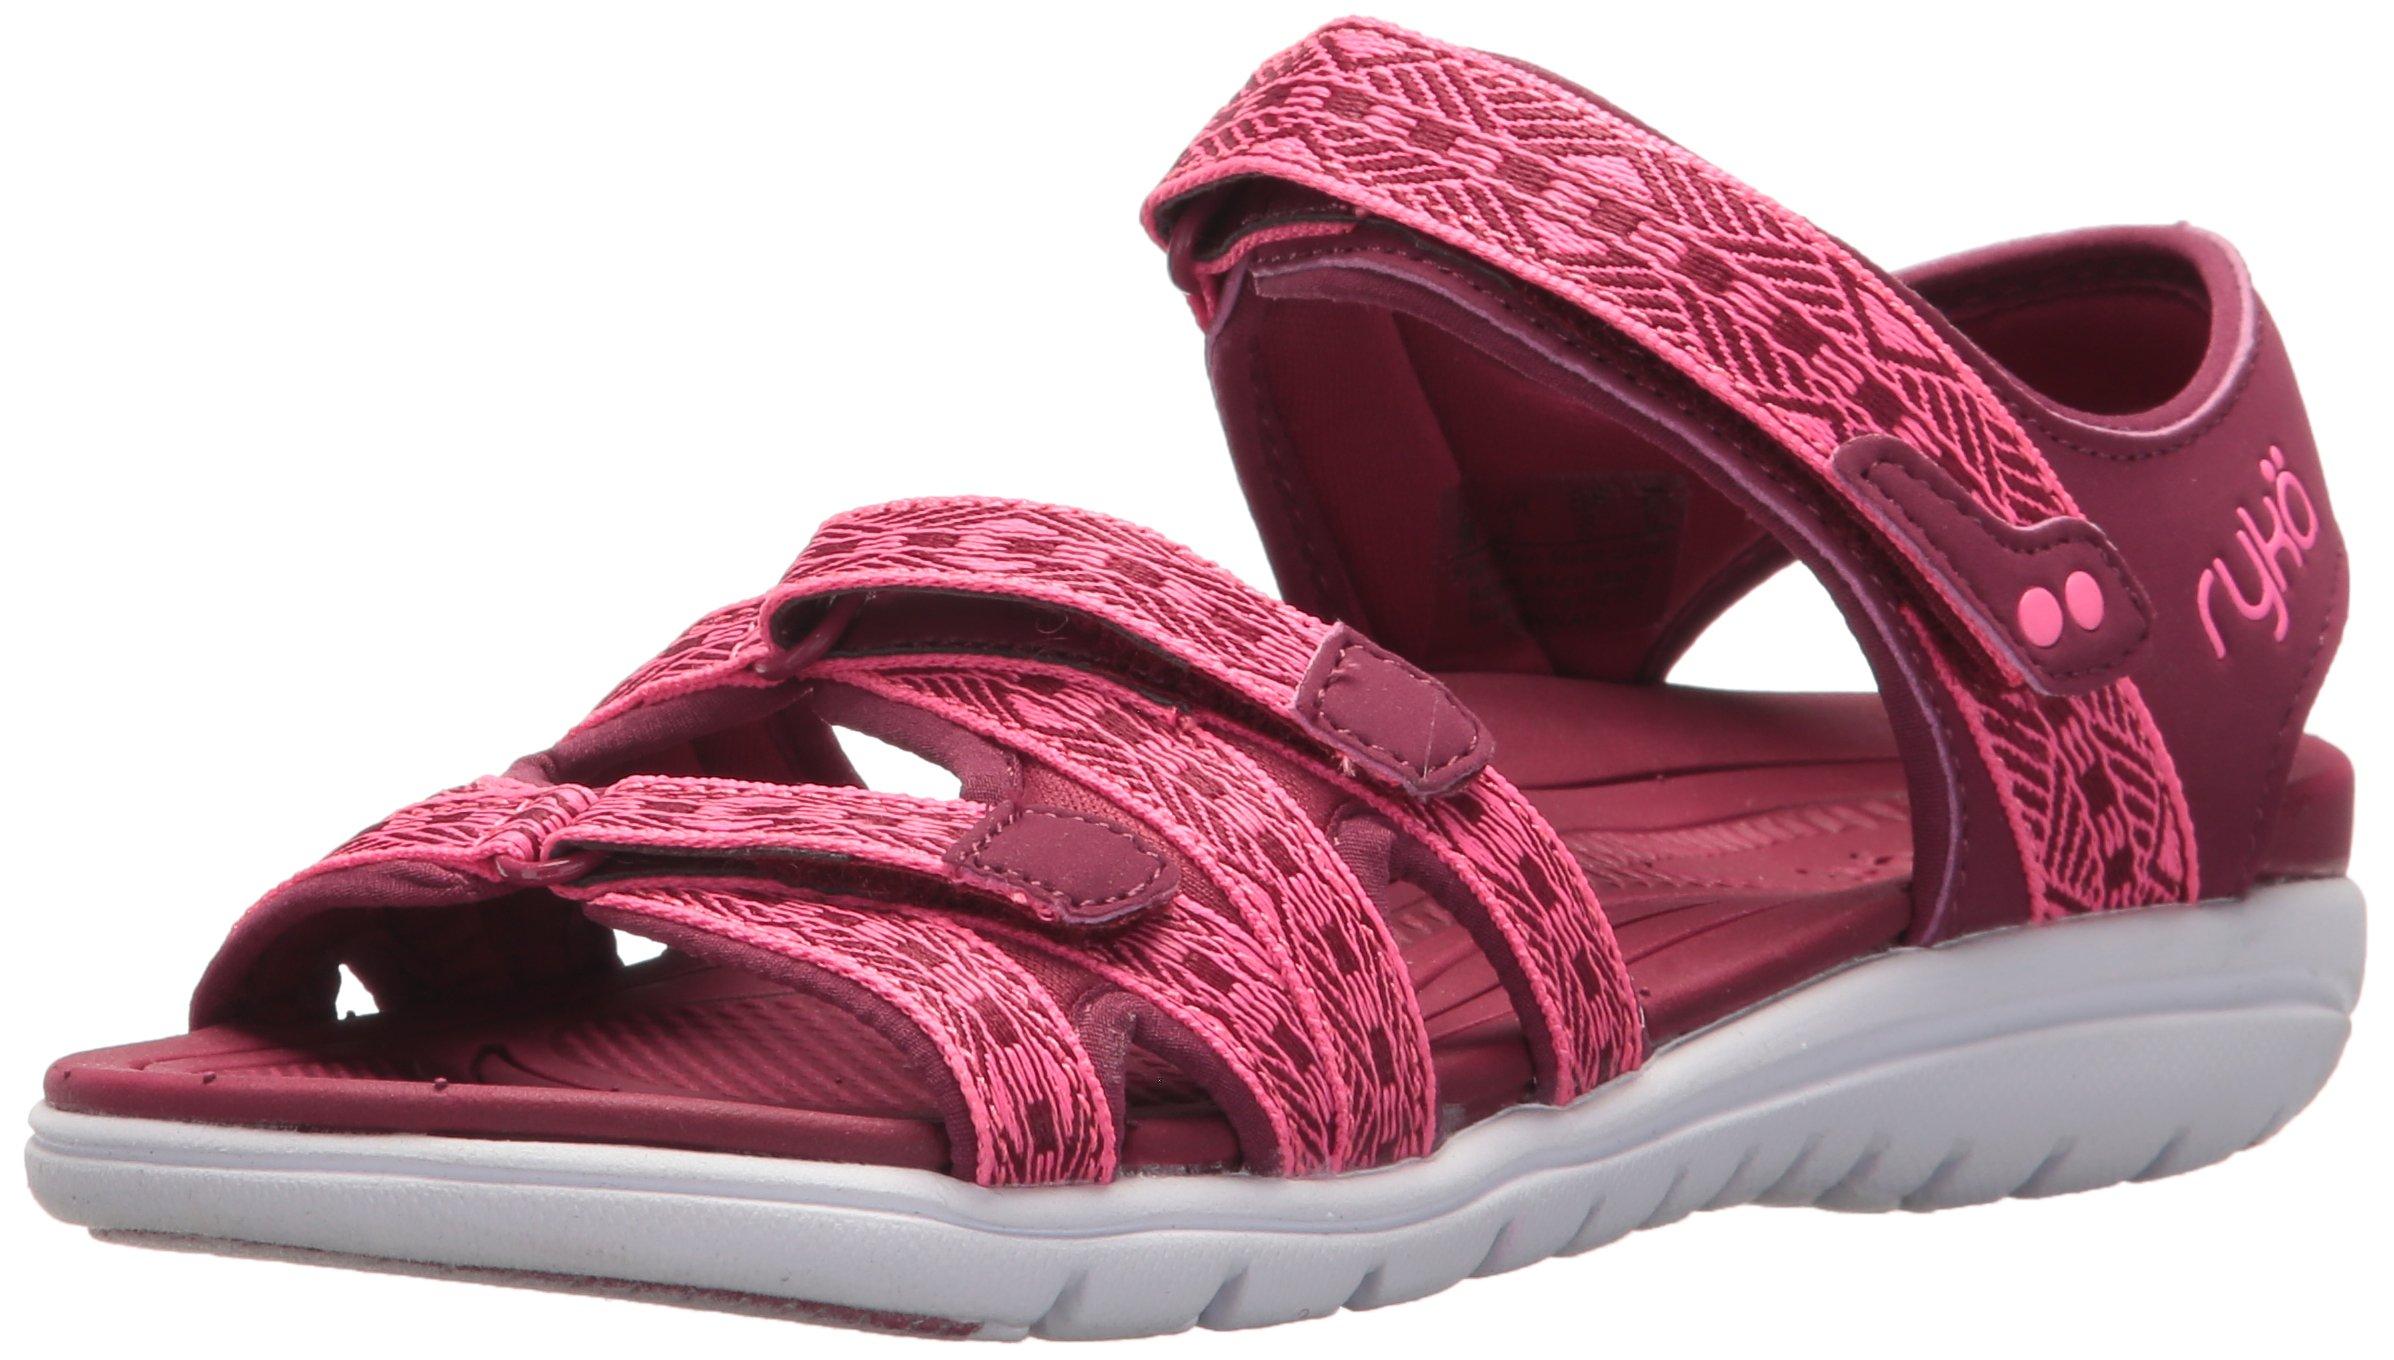 Ryka Women's Savannah Sport Sandal, Beet Red/Hyper Pink, 9.5 W US